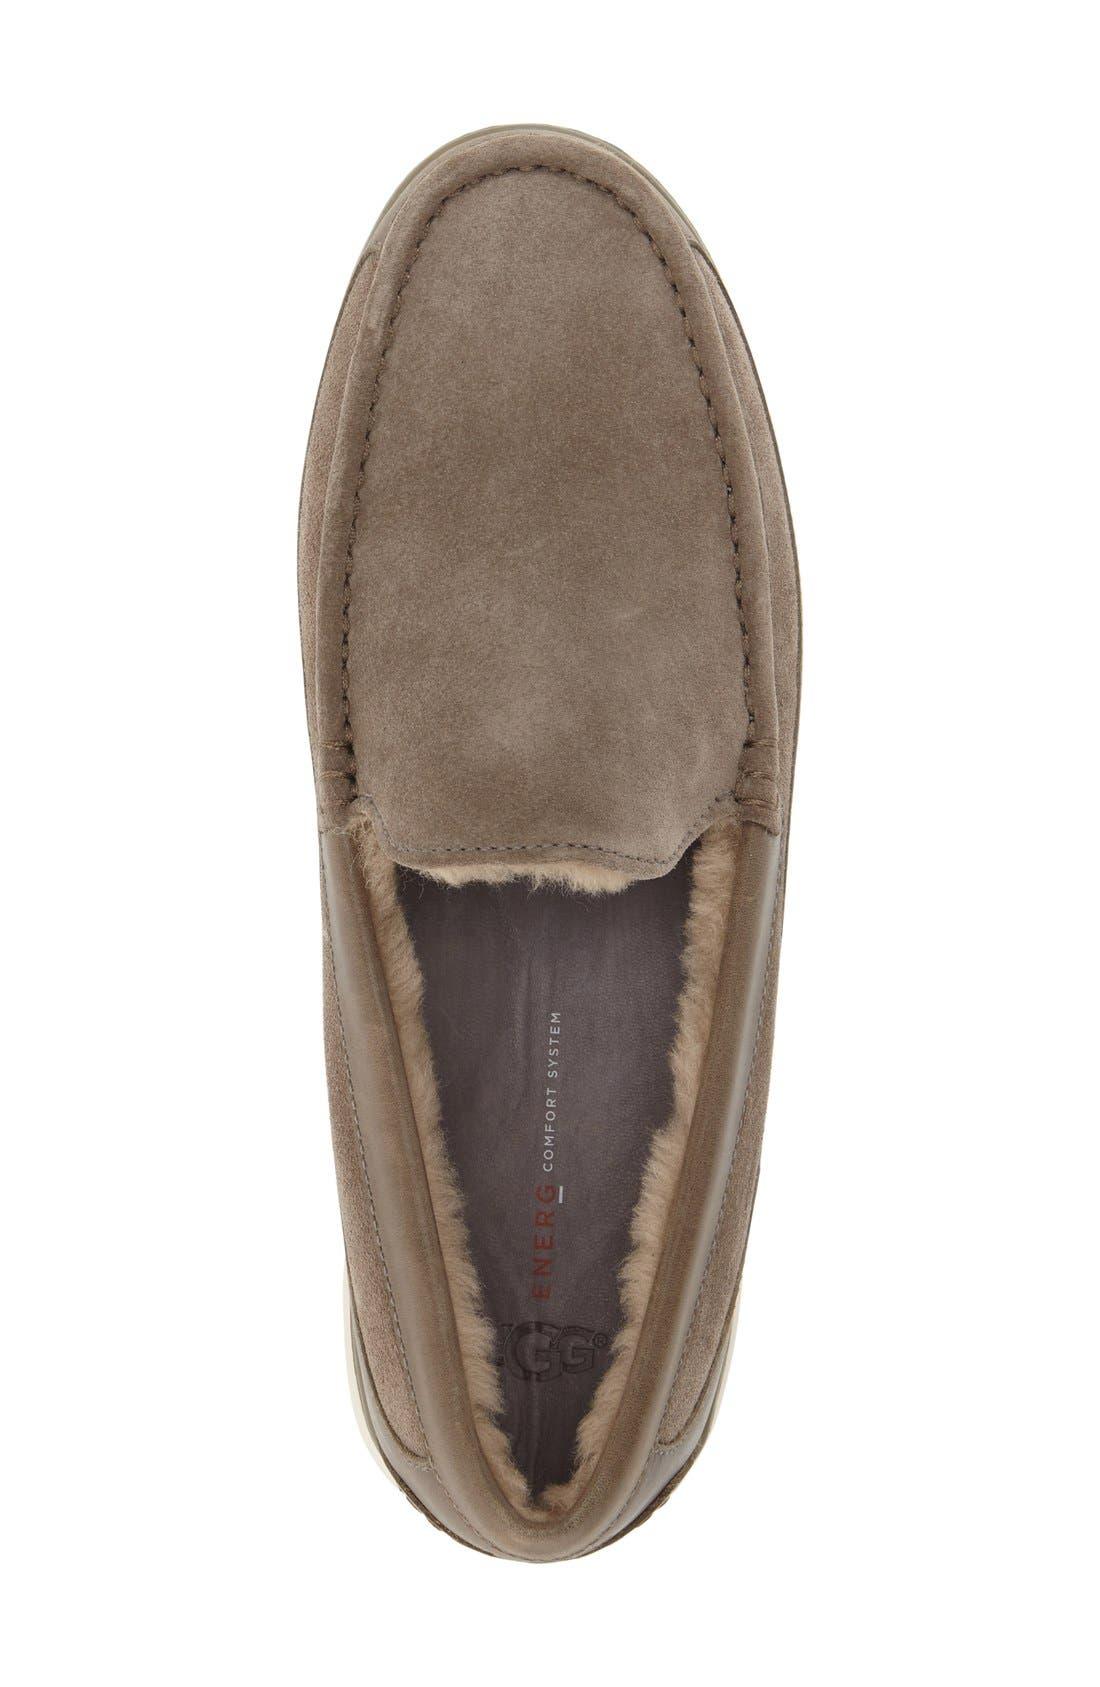 Alternate Image 3  - UGG® Fascot Driving Shoe (Men)